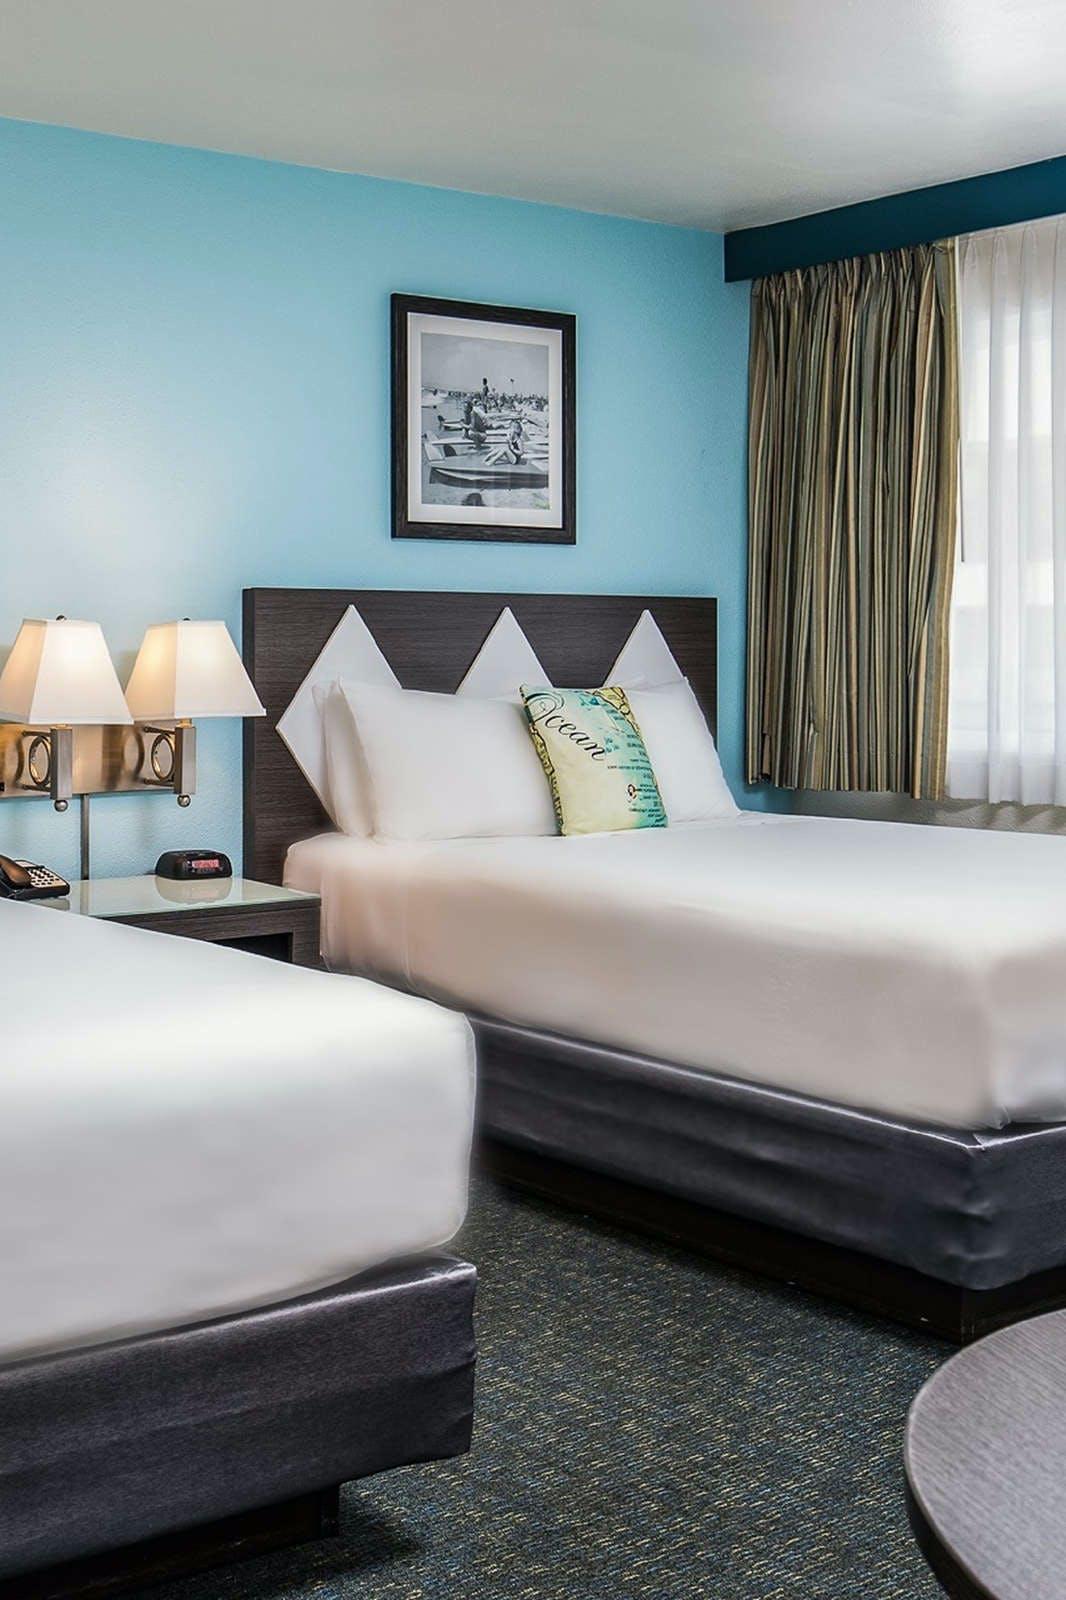 Kings Inn Hotel